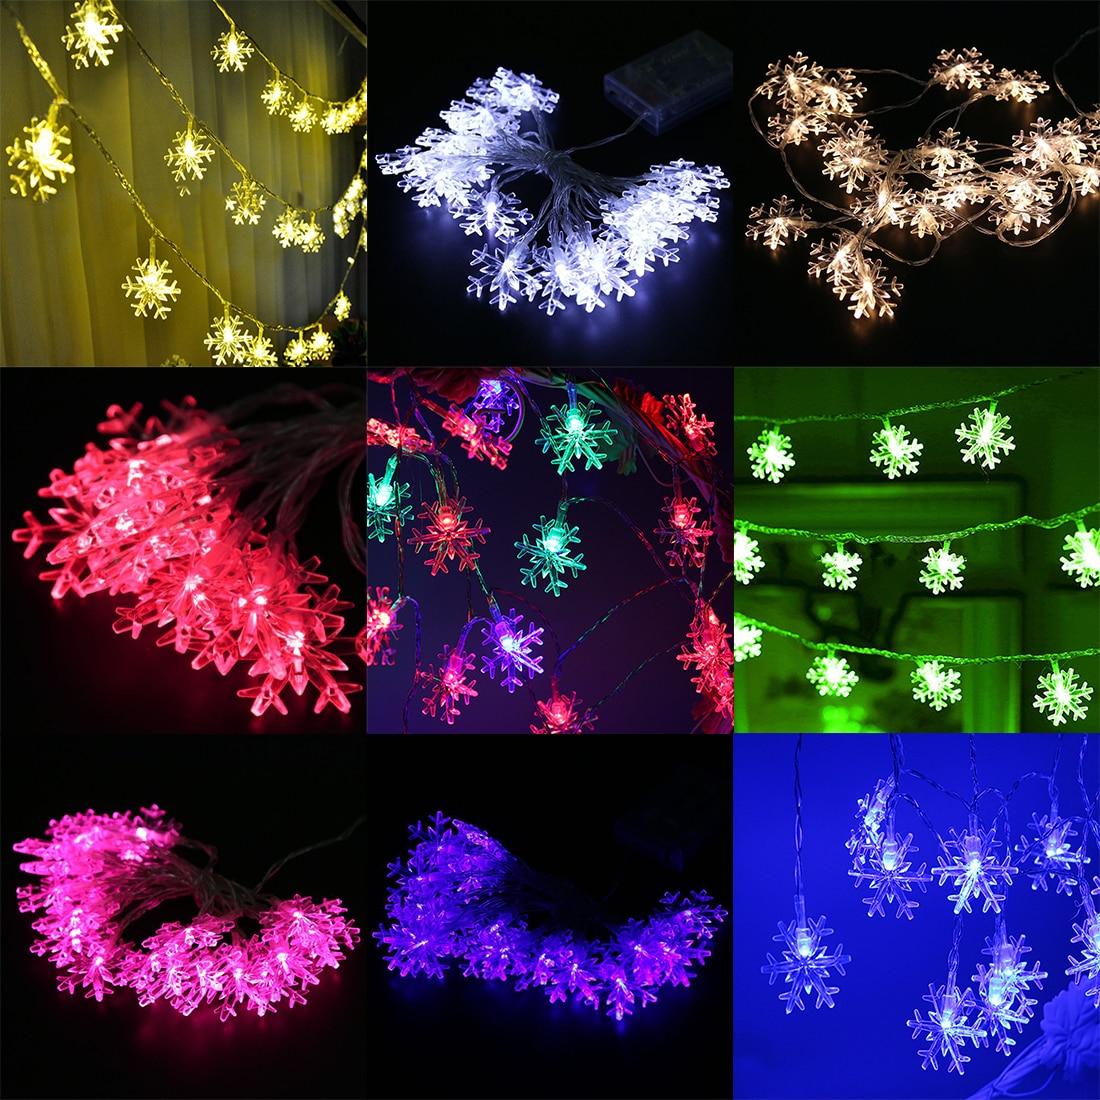 NEW 1pcs Christmas Lights Outdoor 10m 100LED String Lights Garden Light for Home Wedding Party Decoration EU Plug